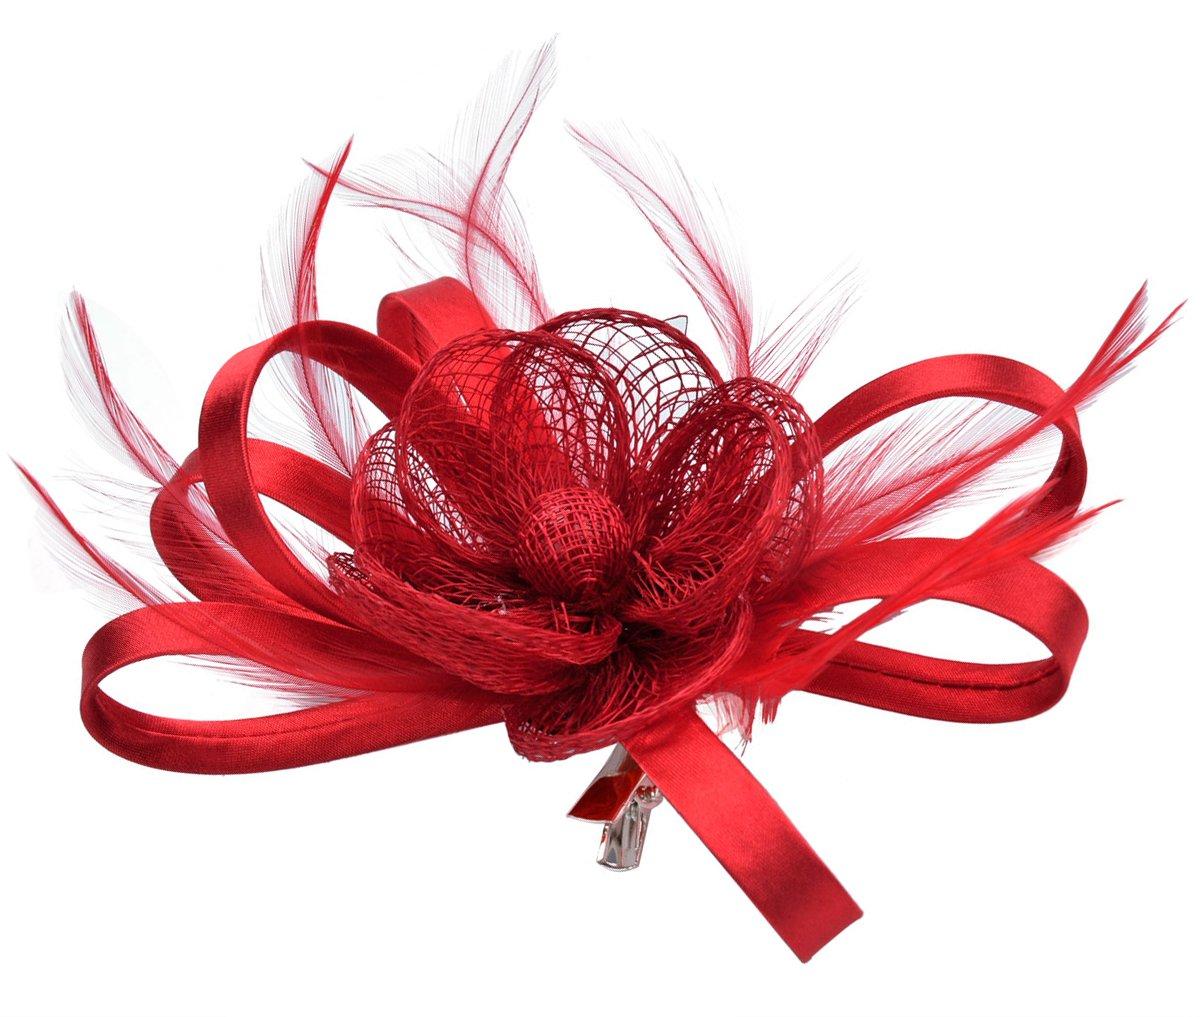 Fascigirl Pillbox Hat Feather Flower Headpiece Wedding Fascinator Corsage Brooch Pin Hair Clip for Ladies Day VVG092950HPVVJ733